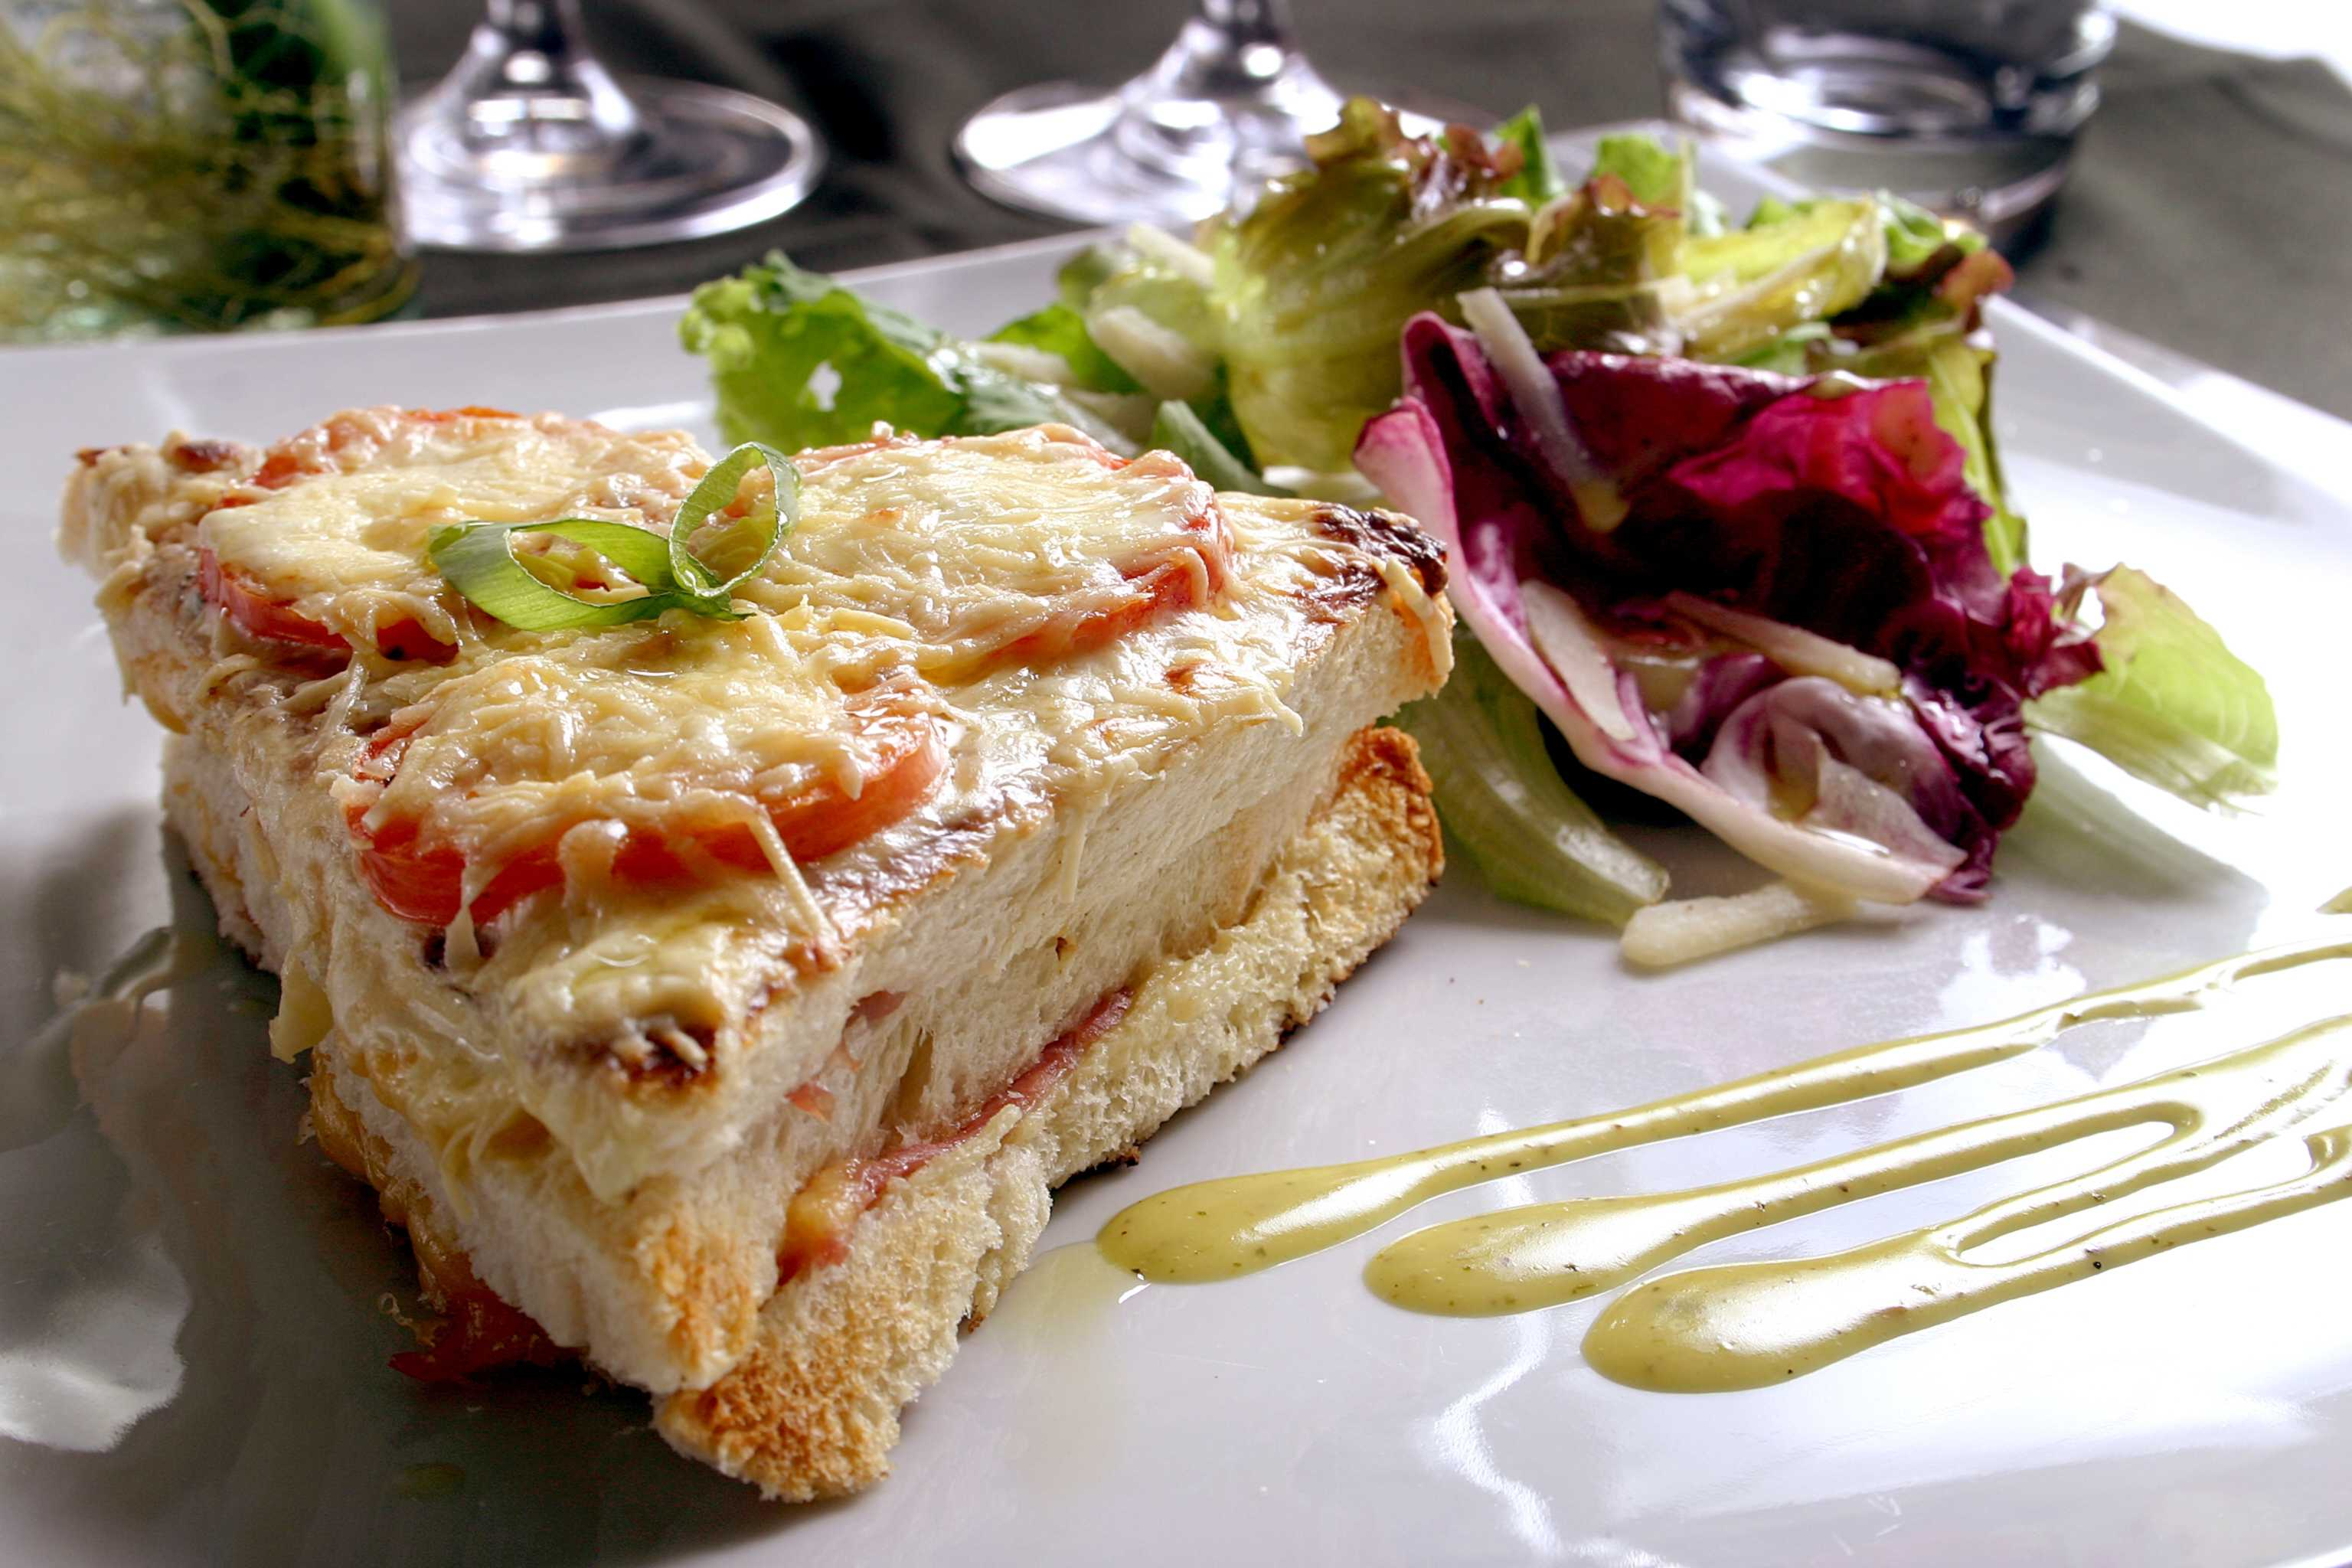 Delicious snacks, Croque Monsieur, France, Presentation 16